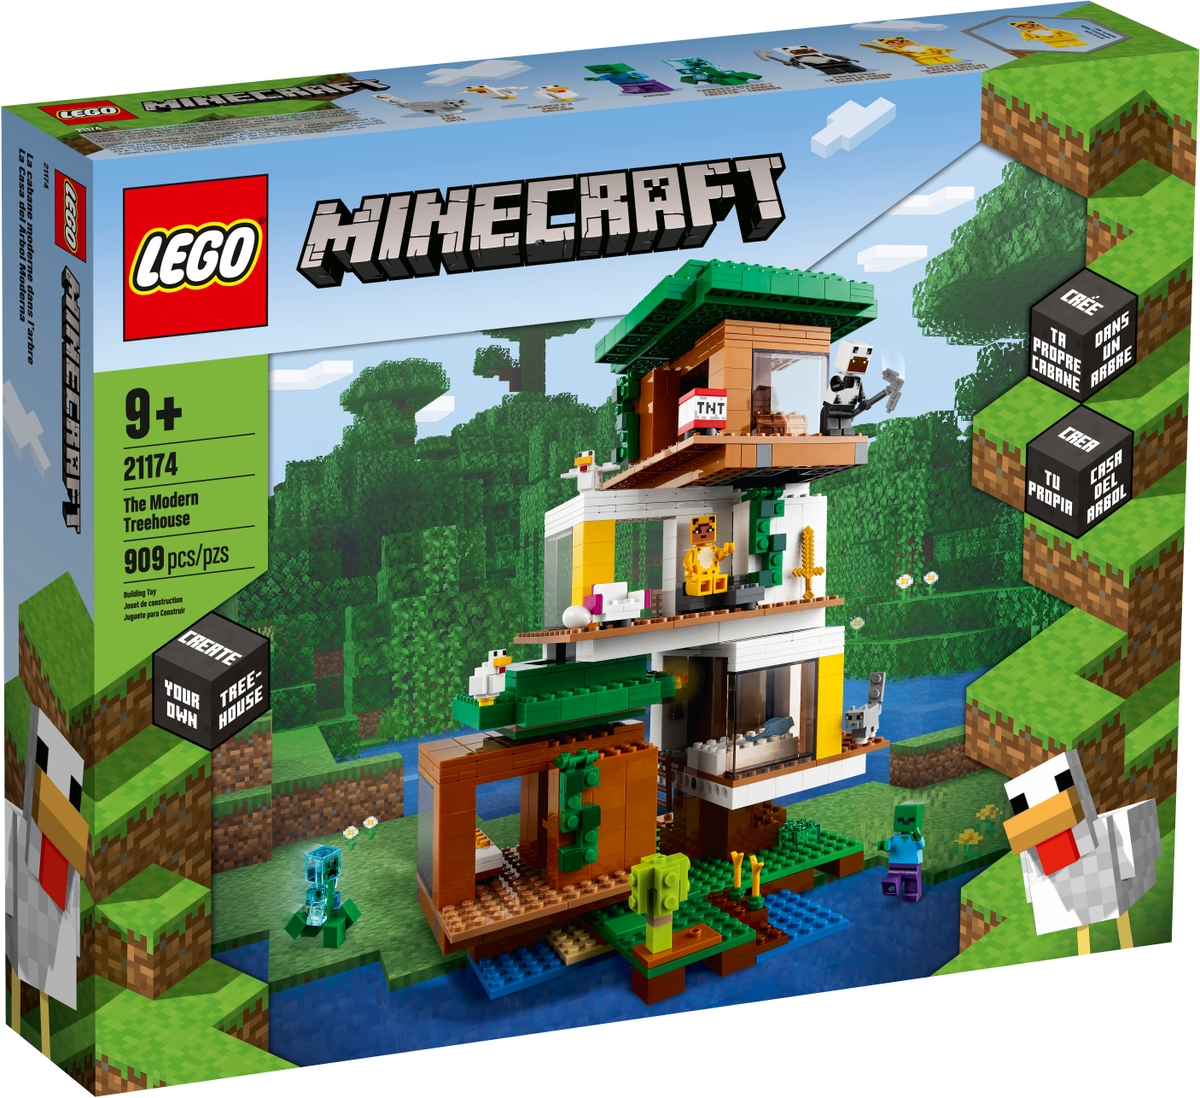 lego 21174 the modern treehouse